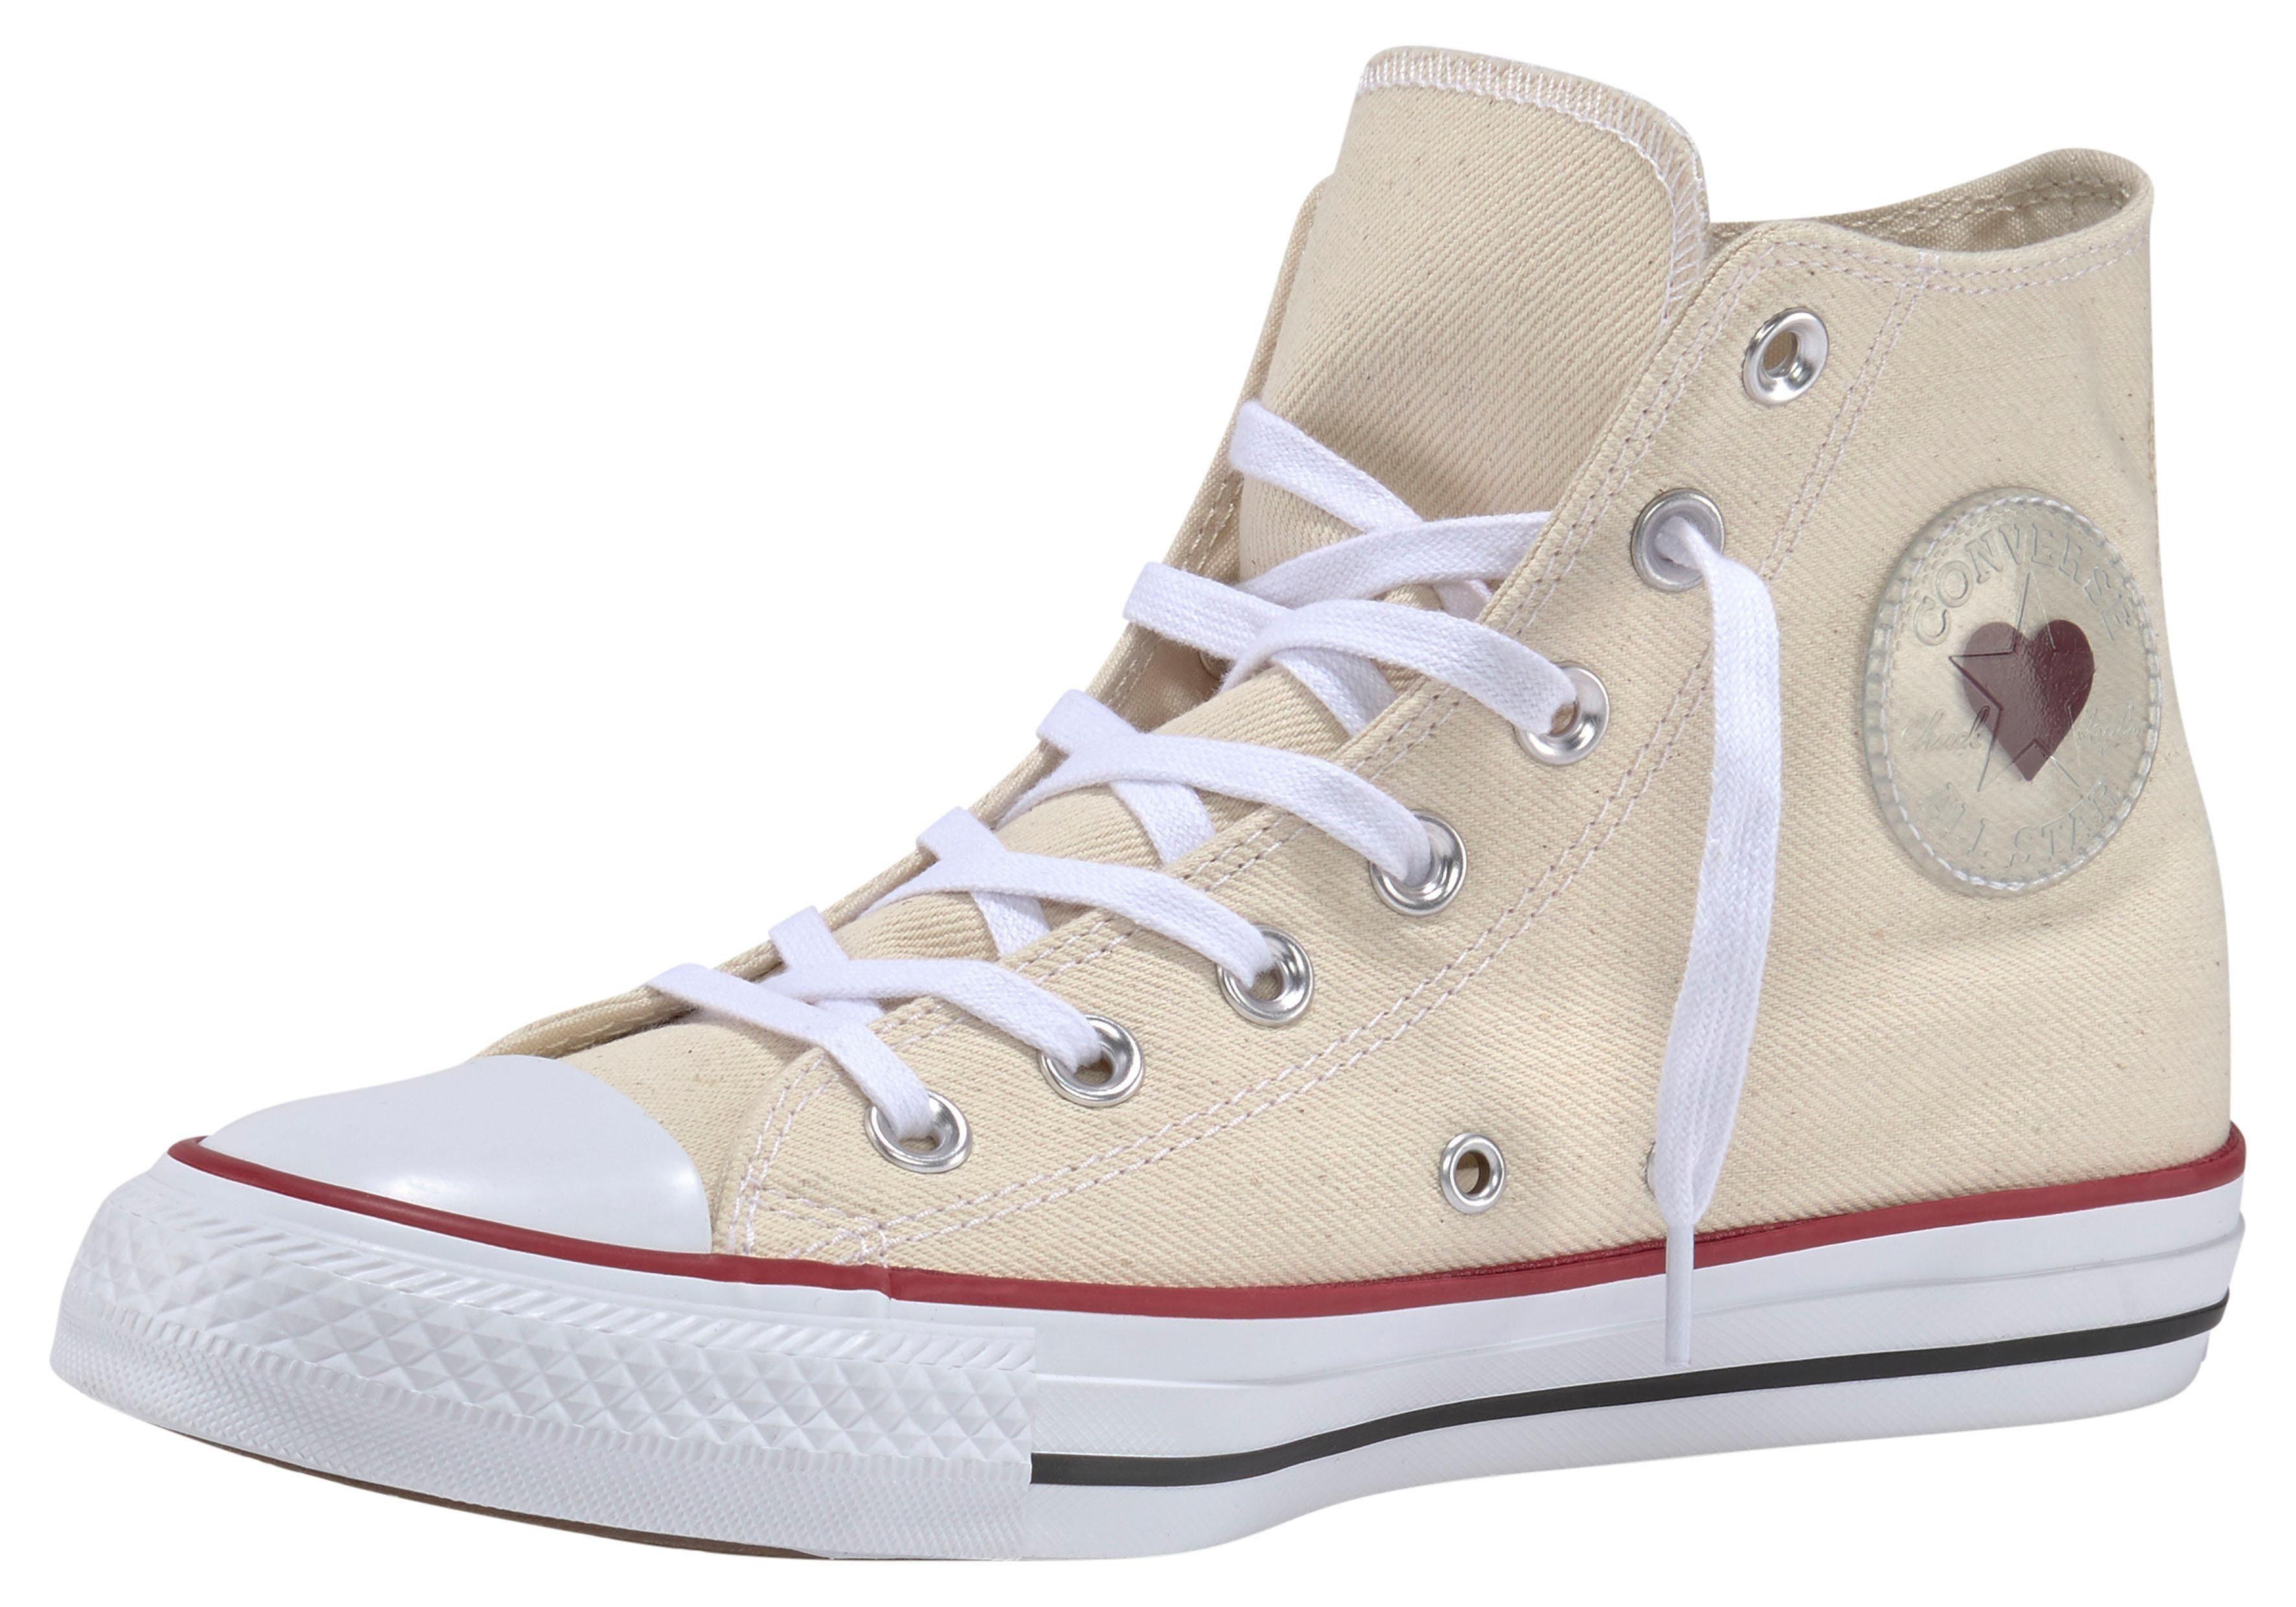 Converse »Chuck Taylor All Star« Sneaker kaufen | OTTO